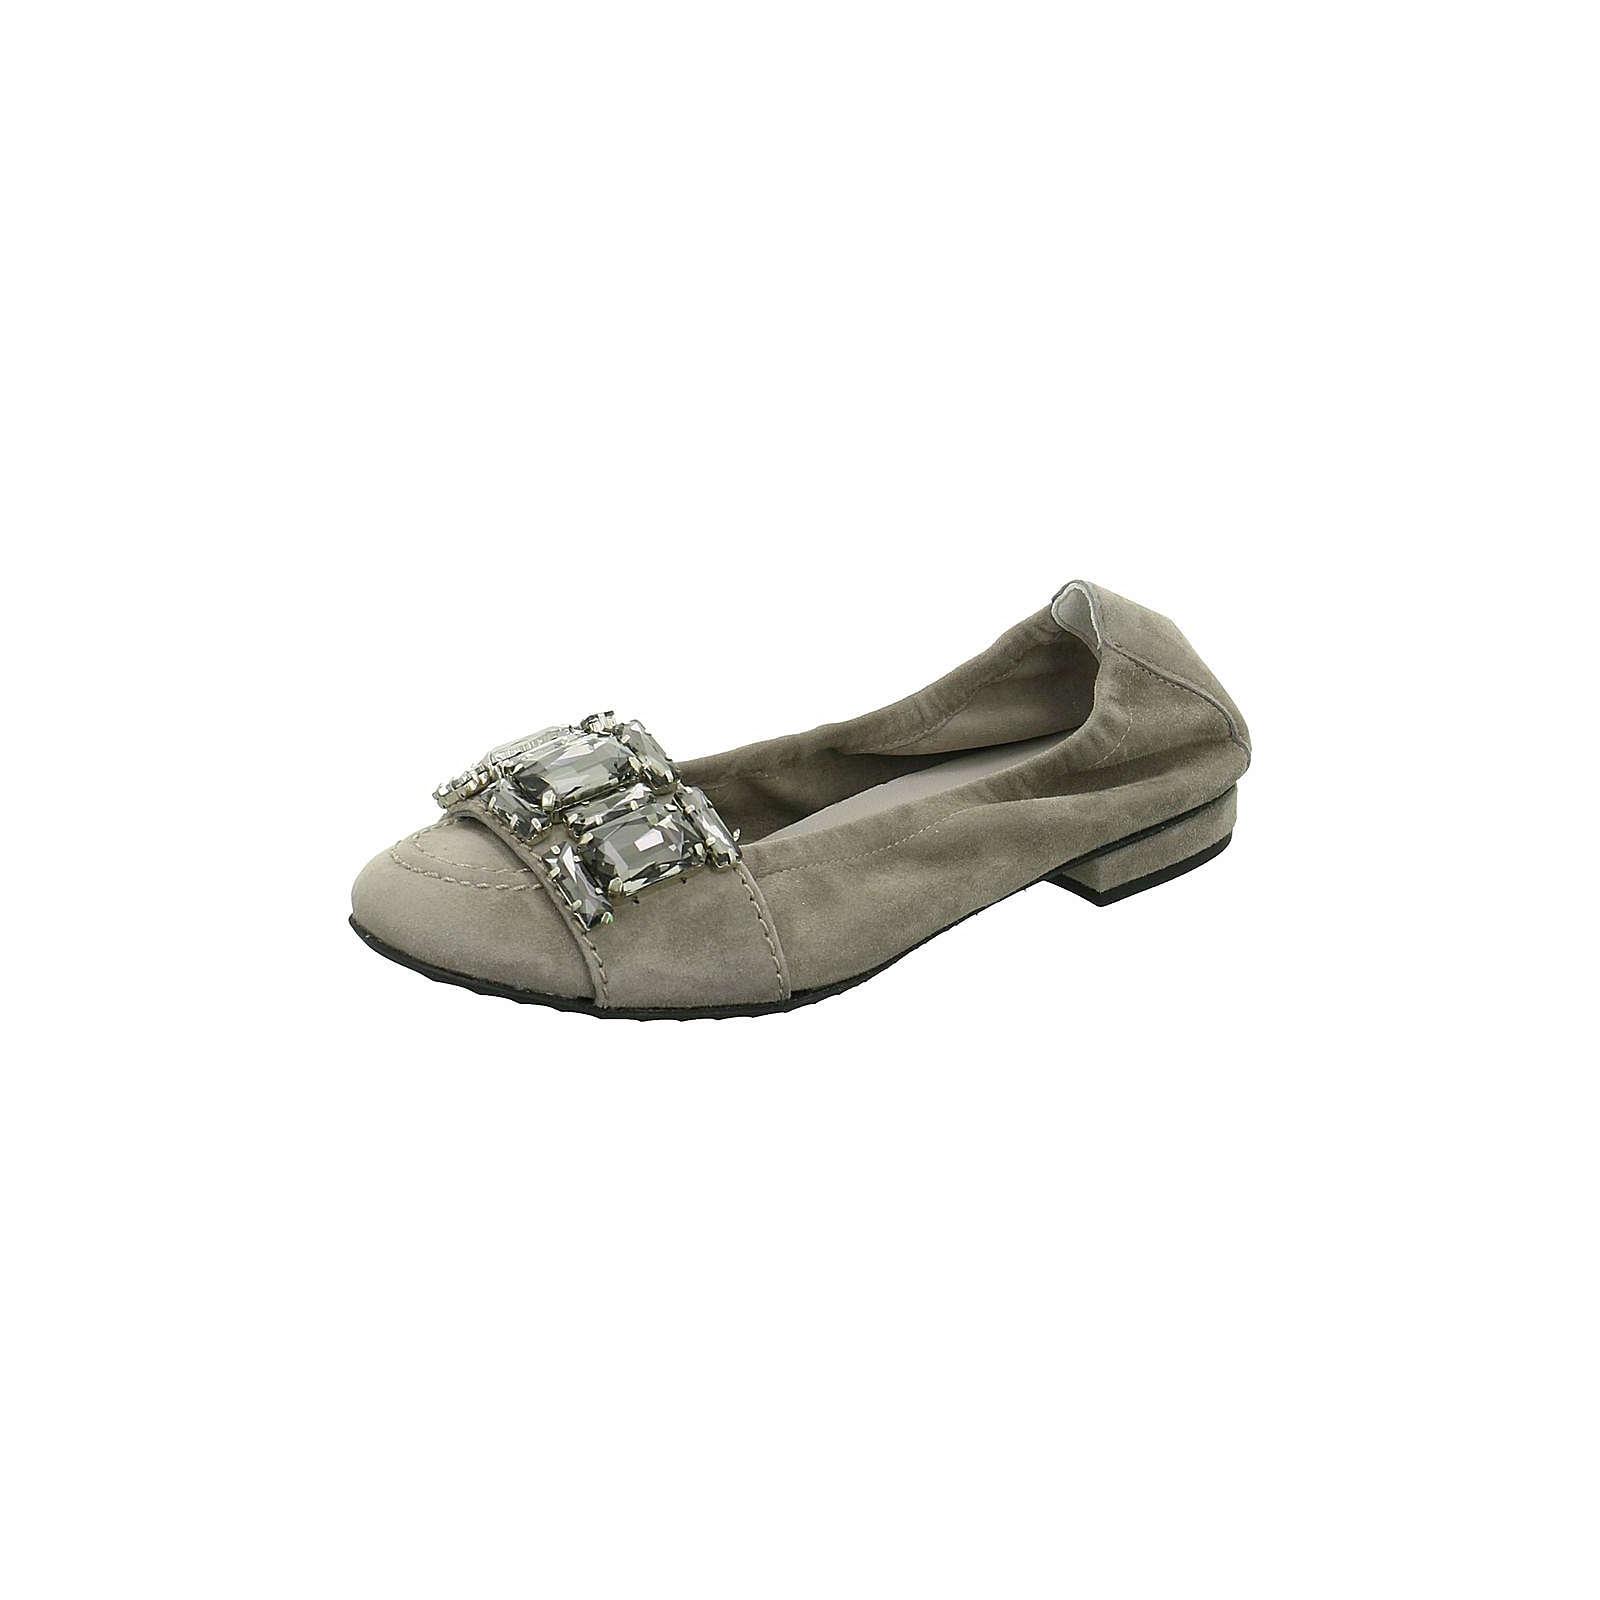 Kennel & Schmenger Ballerinas grau grau Damen Gr. 38,5